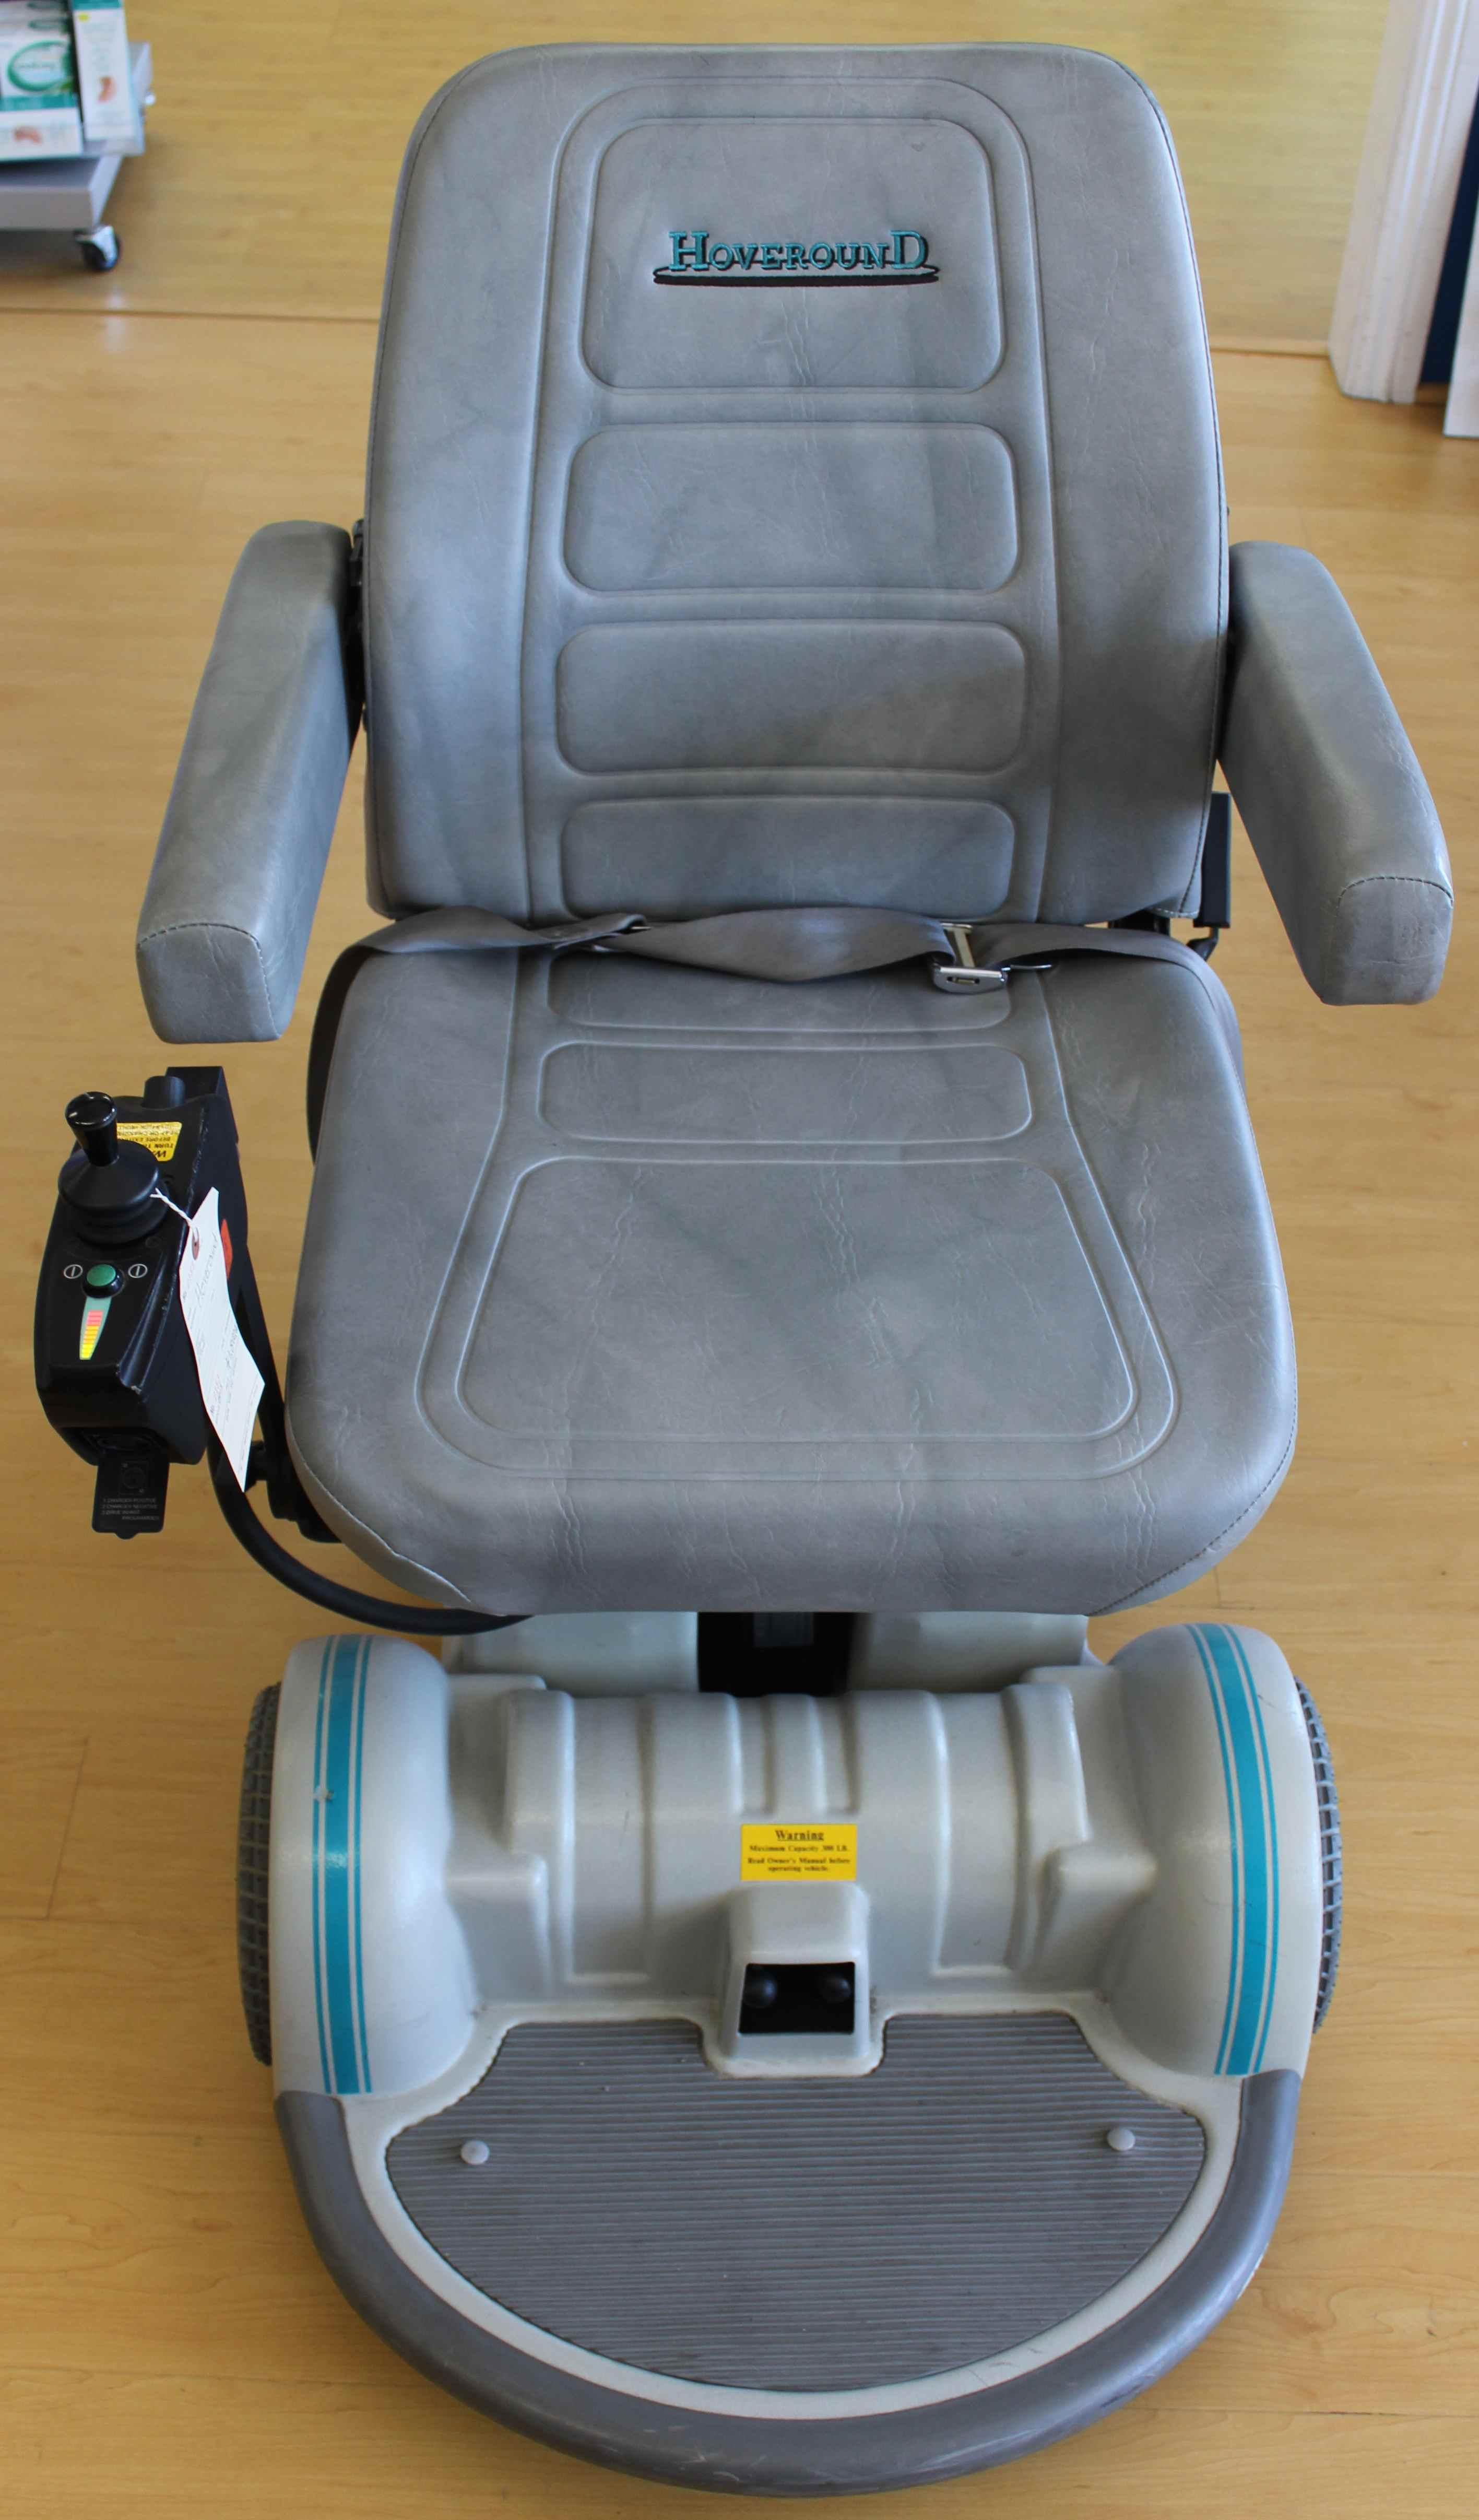 Hoveround Power Wheelchair Rentals & Delivery | Los Angeles | South Bay | Long Beach | Palos Verdes | San Pedro | Torrance | Redondo Beach | Manhattan Beach | Carson